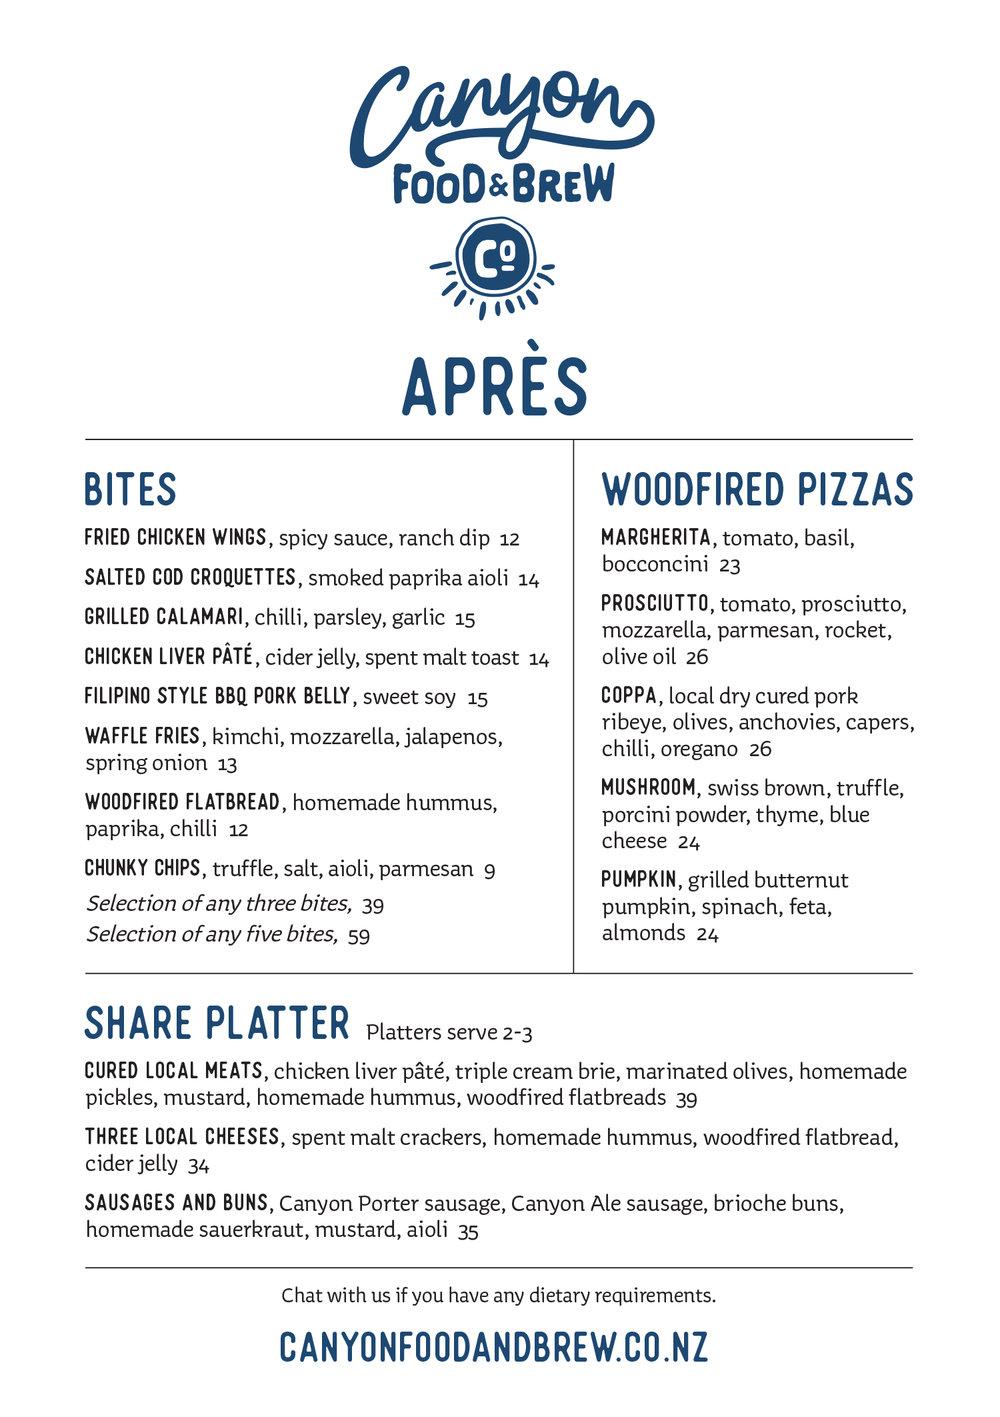 Canyon-Food-&-Brew-Apres.jpg